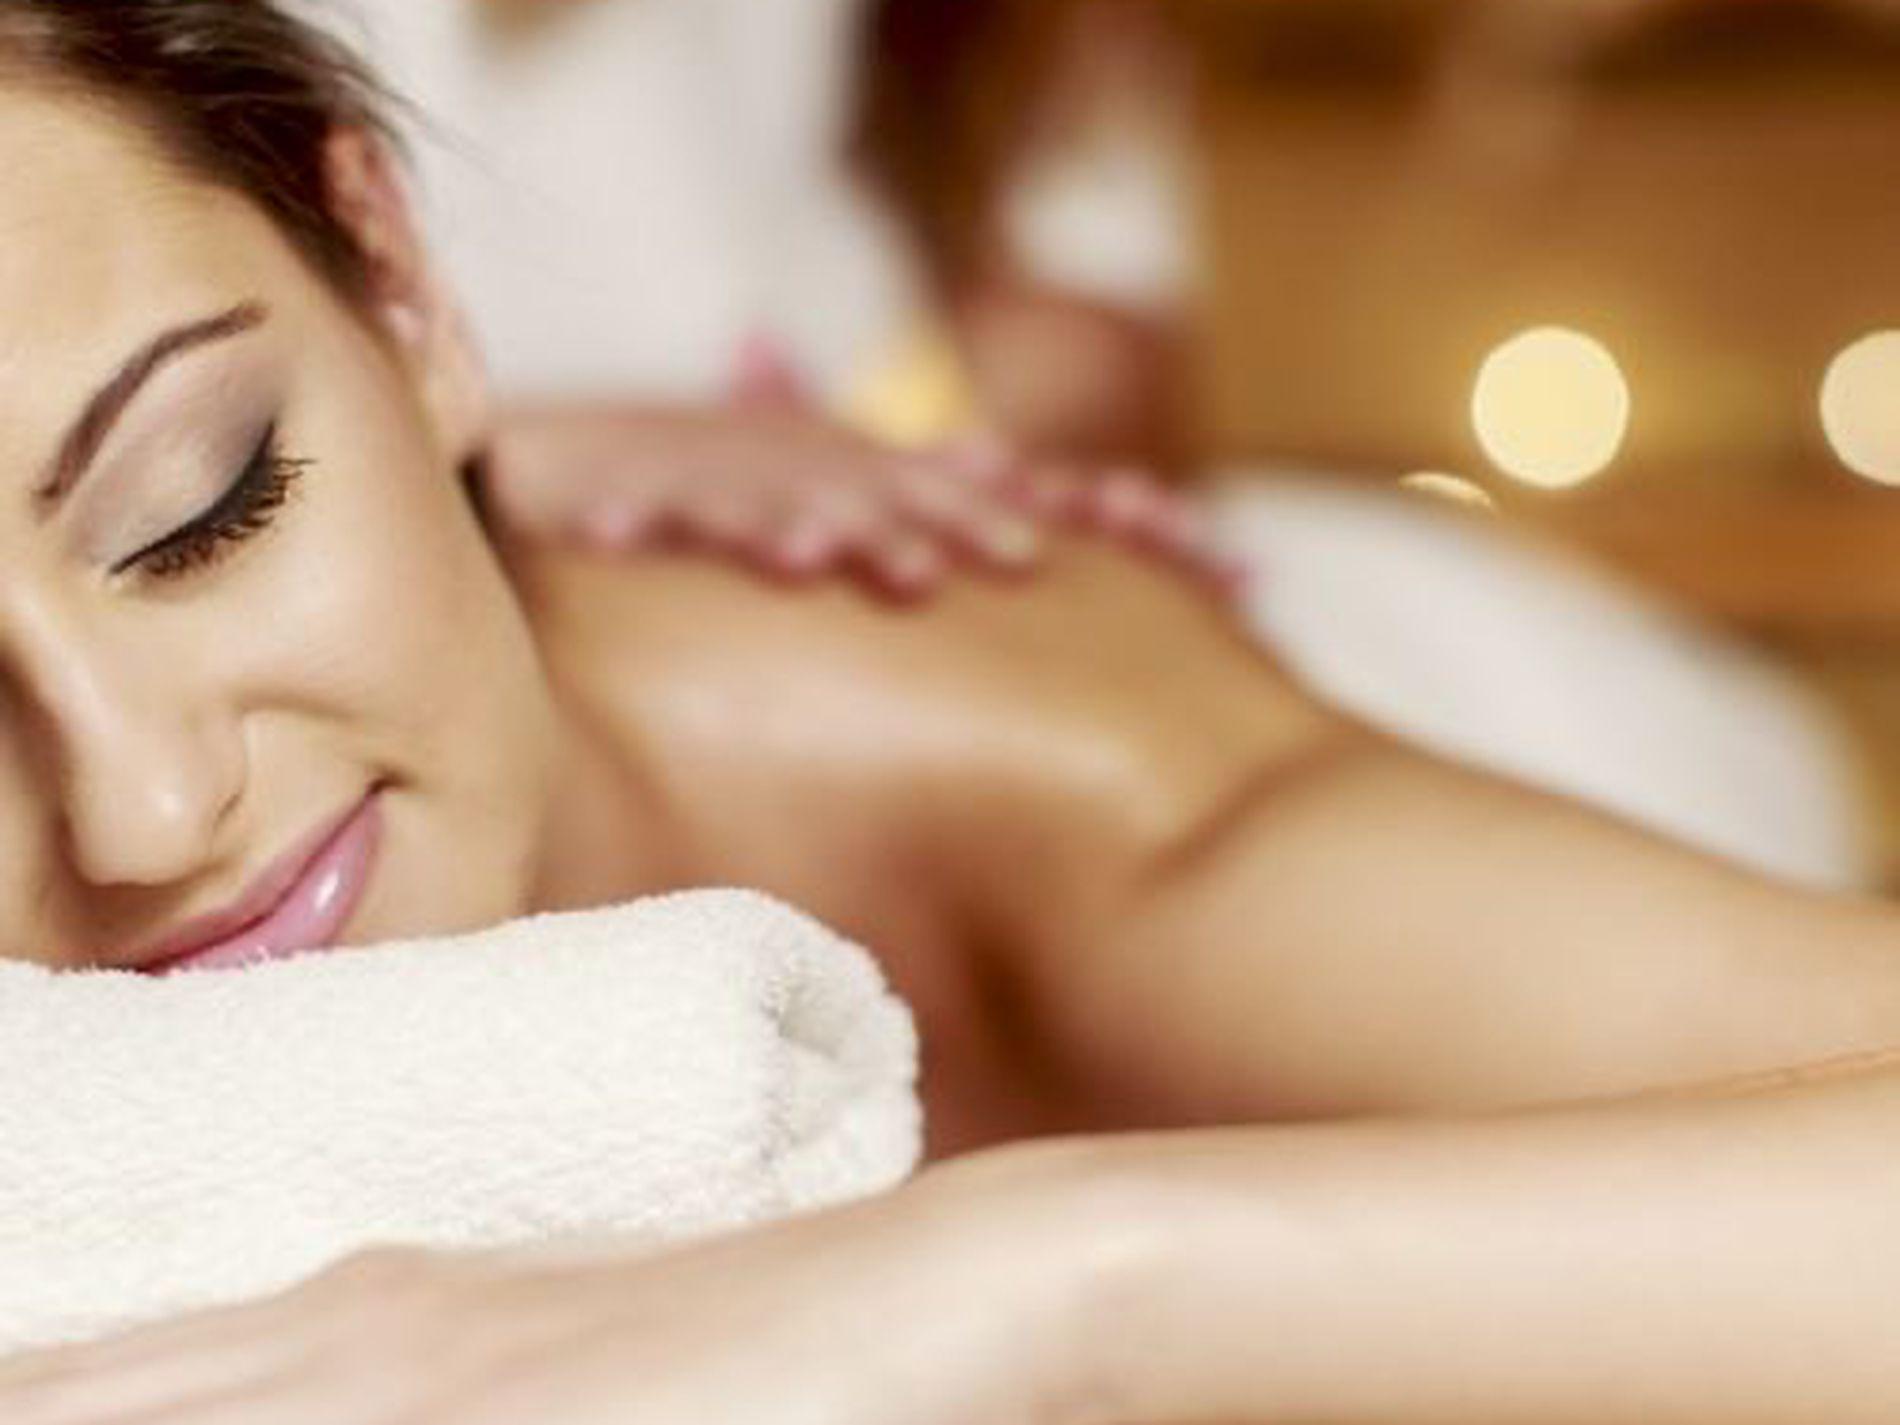 XKR2020036 Massage - No competition - Well established - Undermanagement